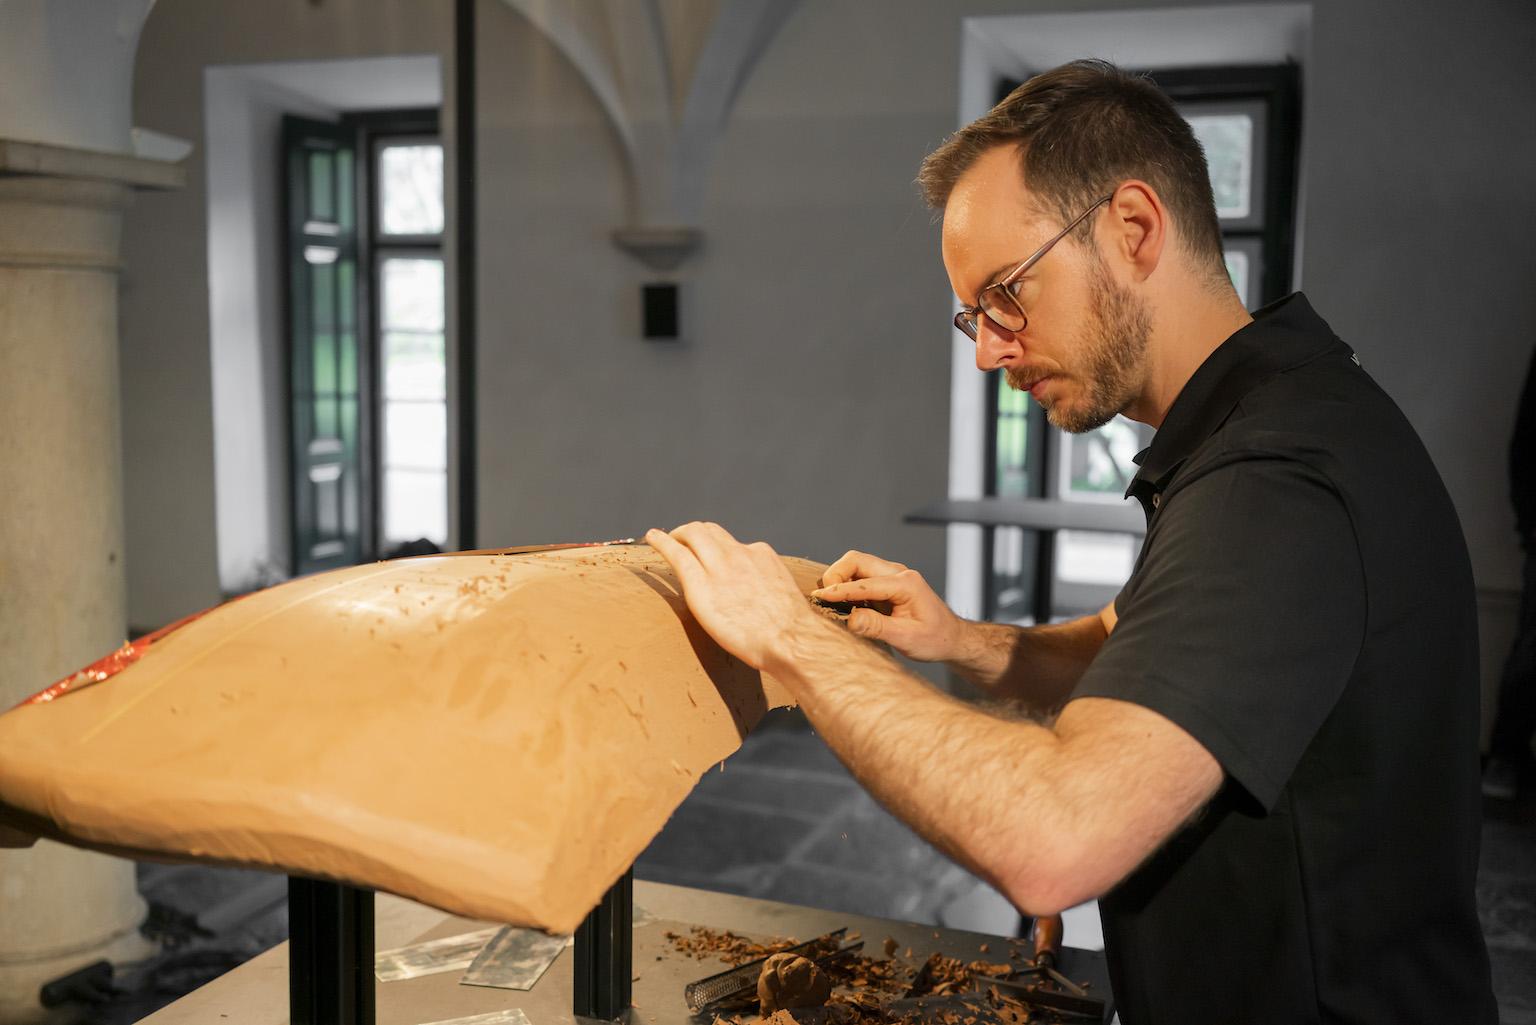 Clay modeler Johannes Collopy : soul-infusing artist